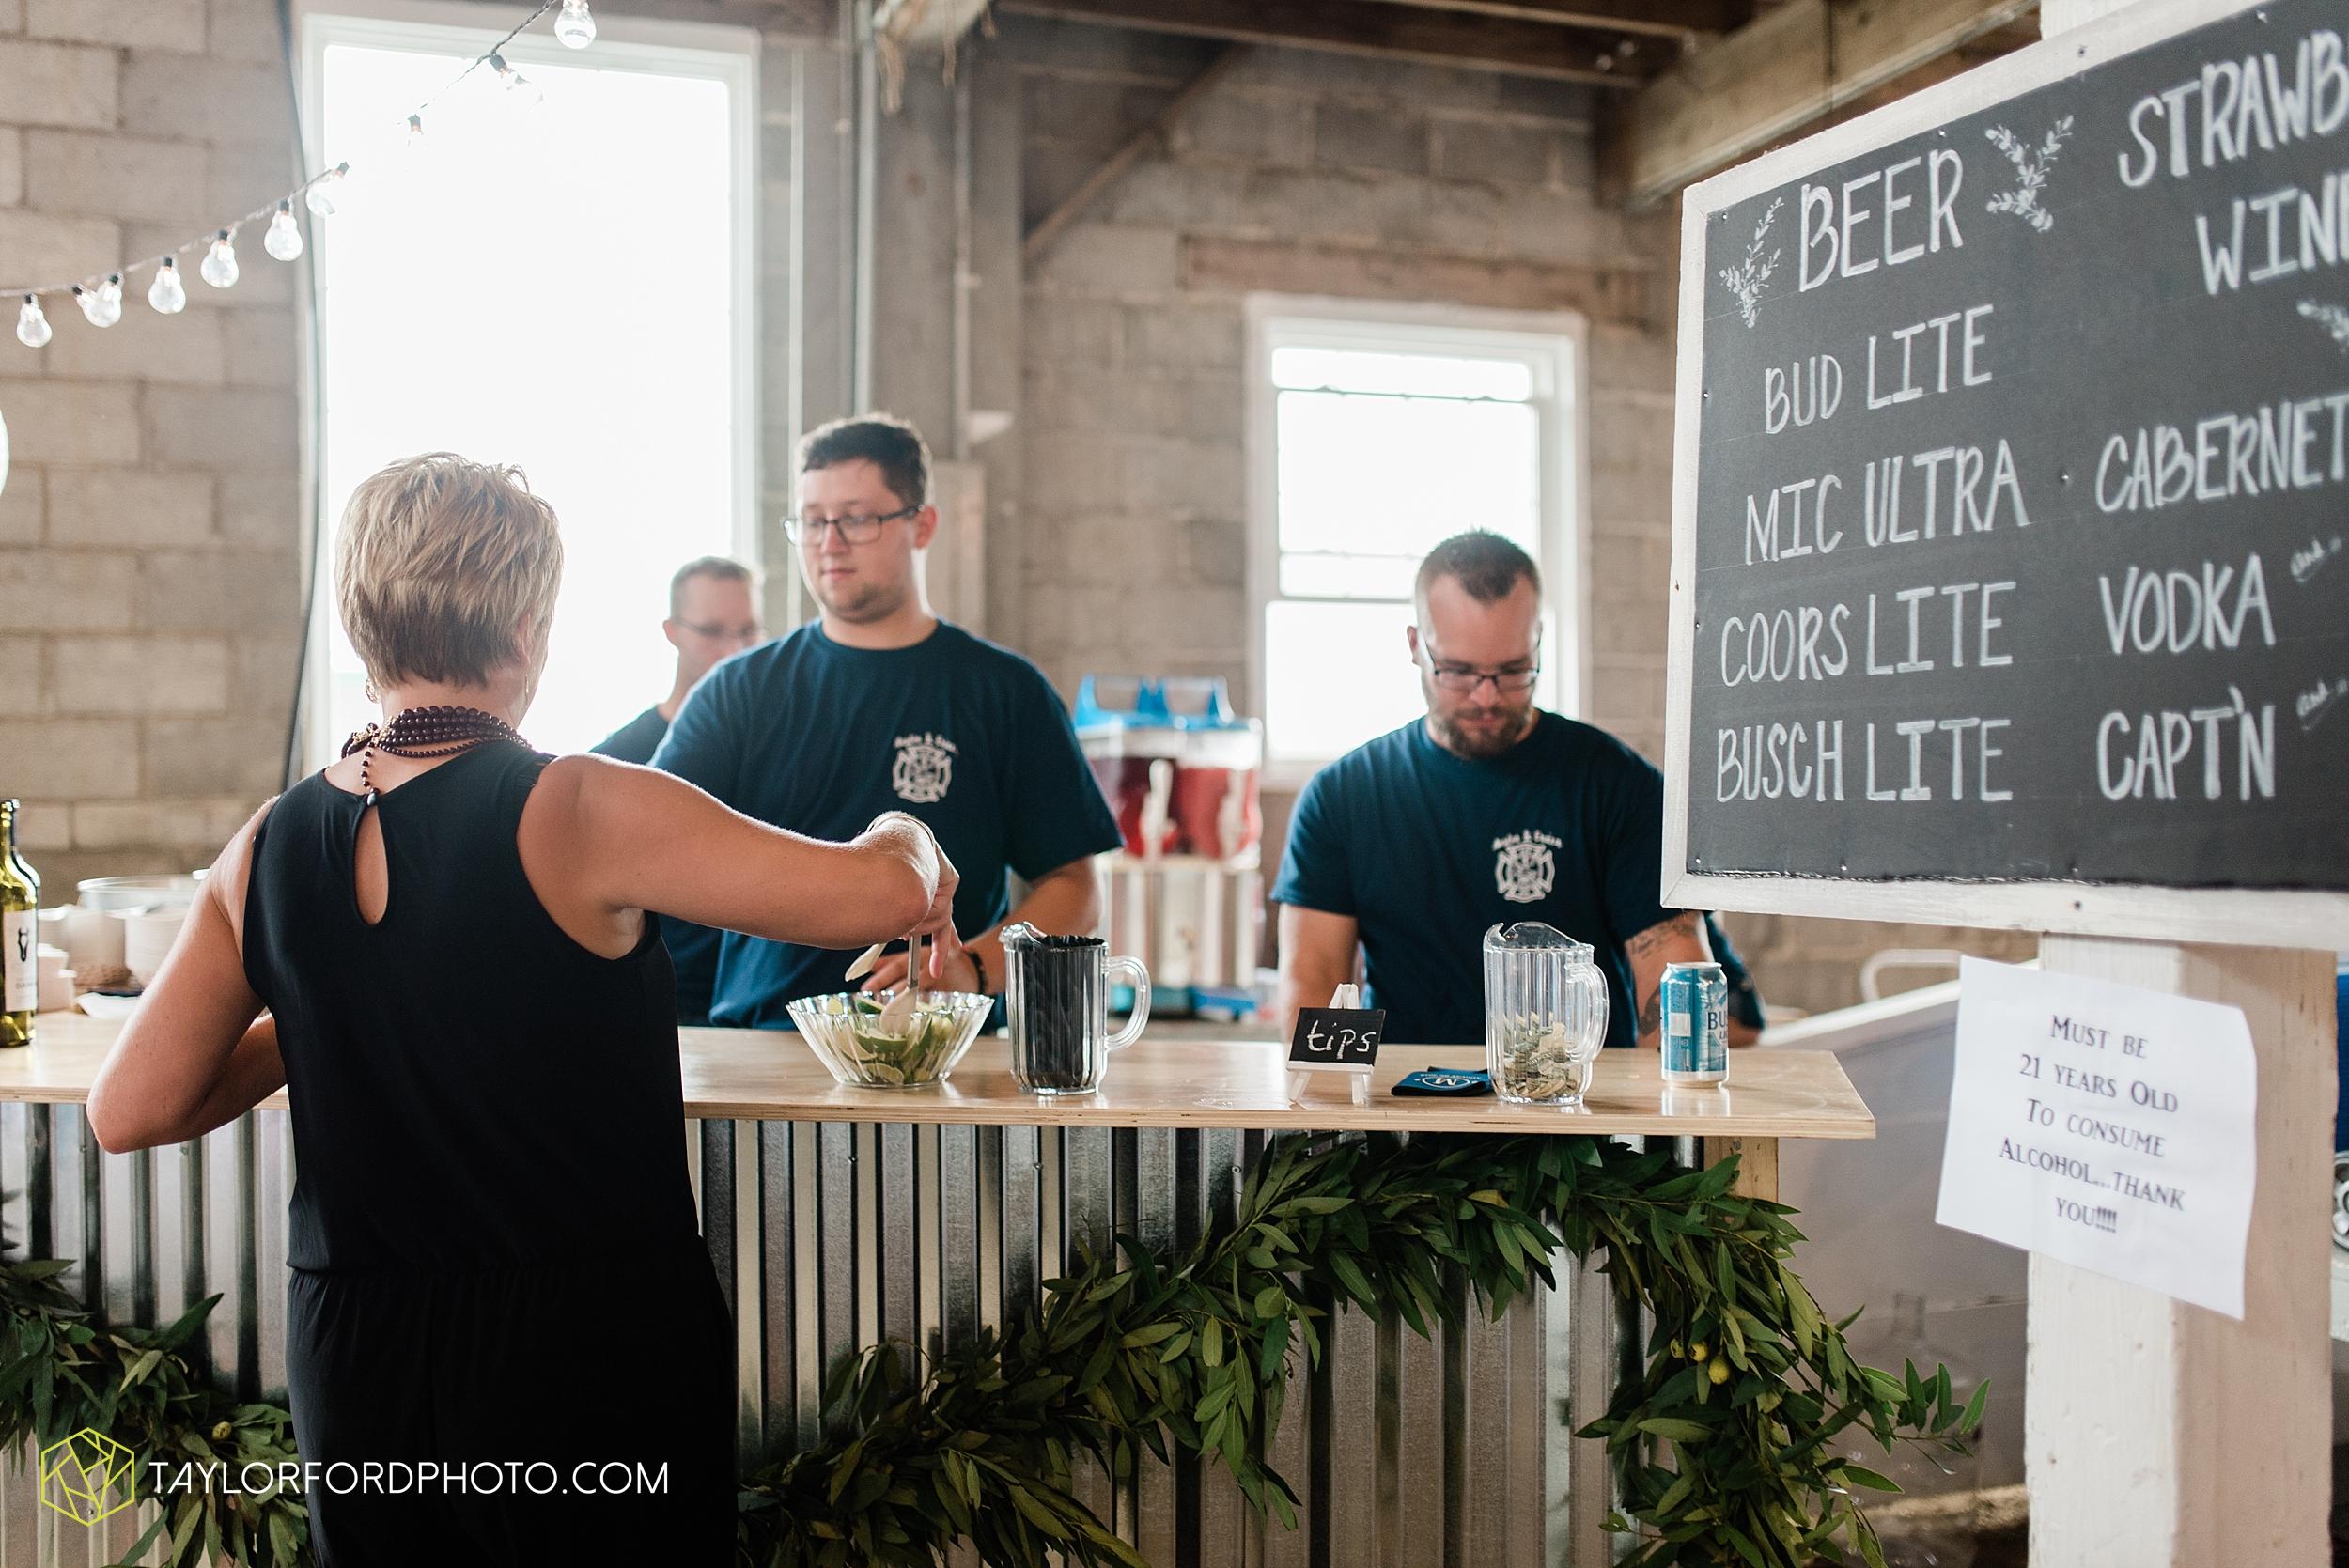 van-wert-ohio-first-united-methodist-church-county-dairy-barn-wedding-photographer-taylor-ford-photography_9872.jpg